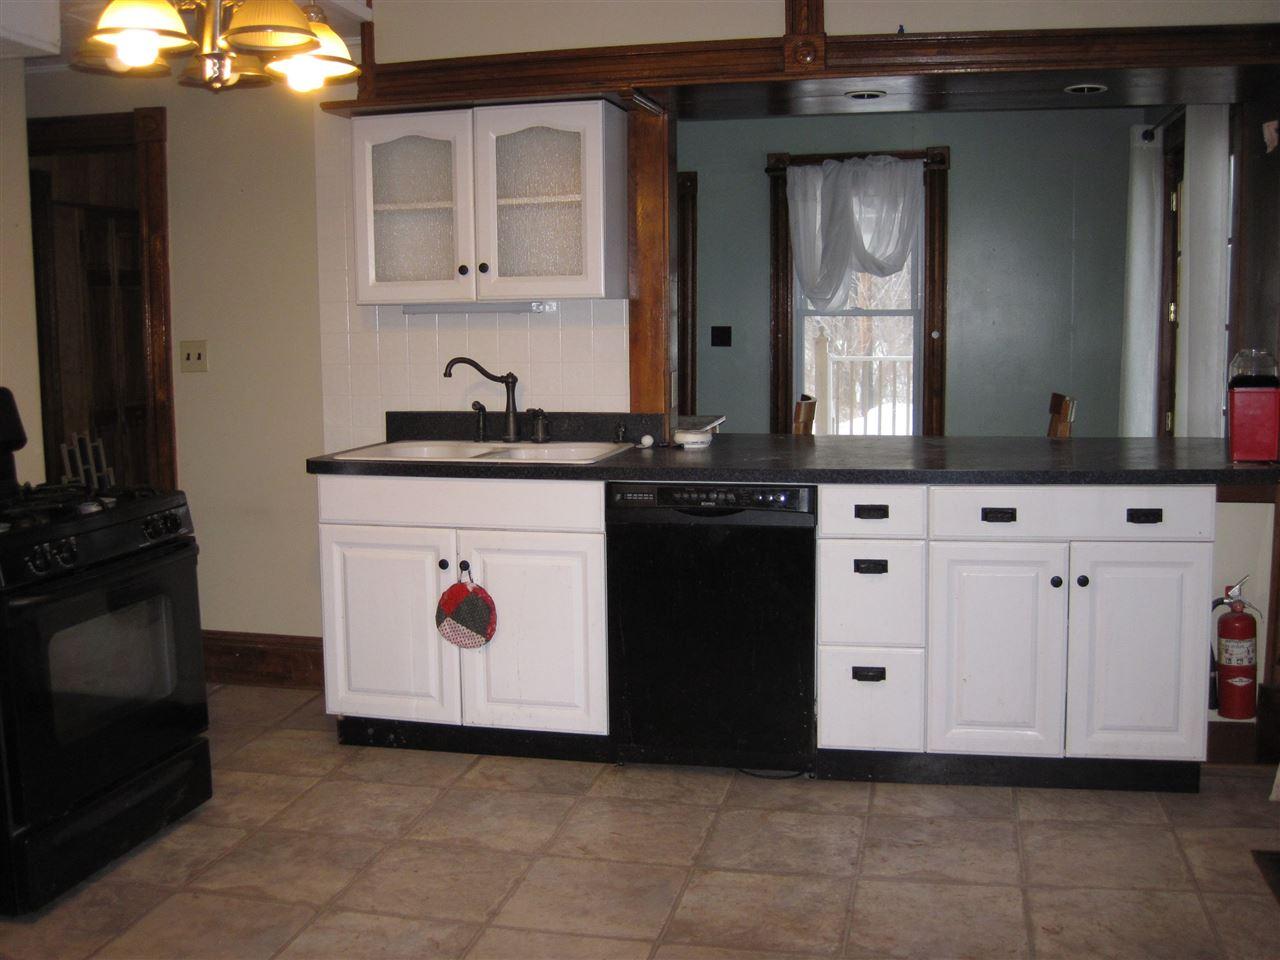 Vermont-Real-Estate-4611920-1